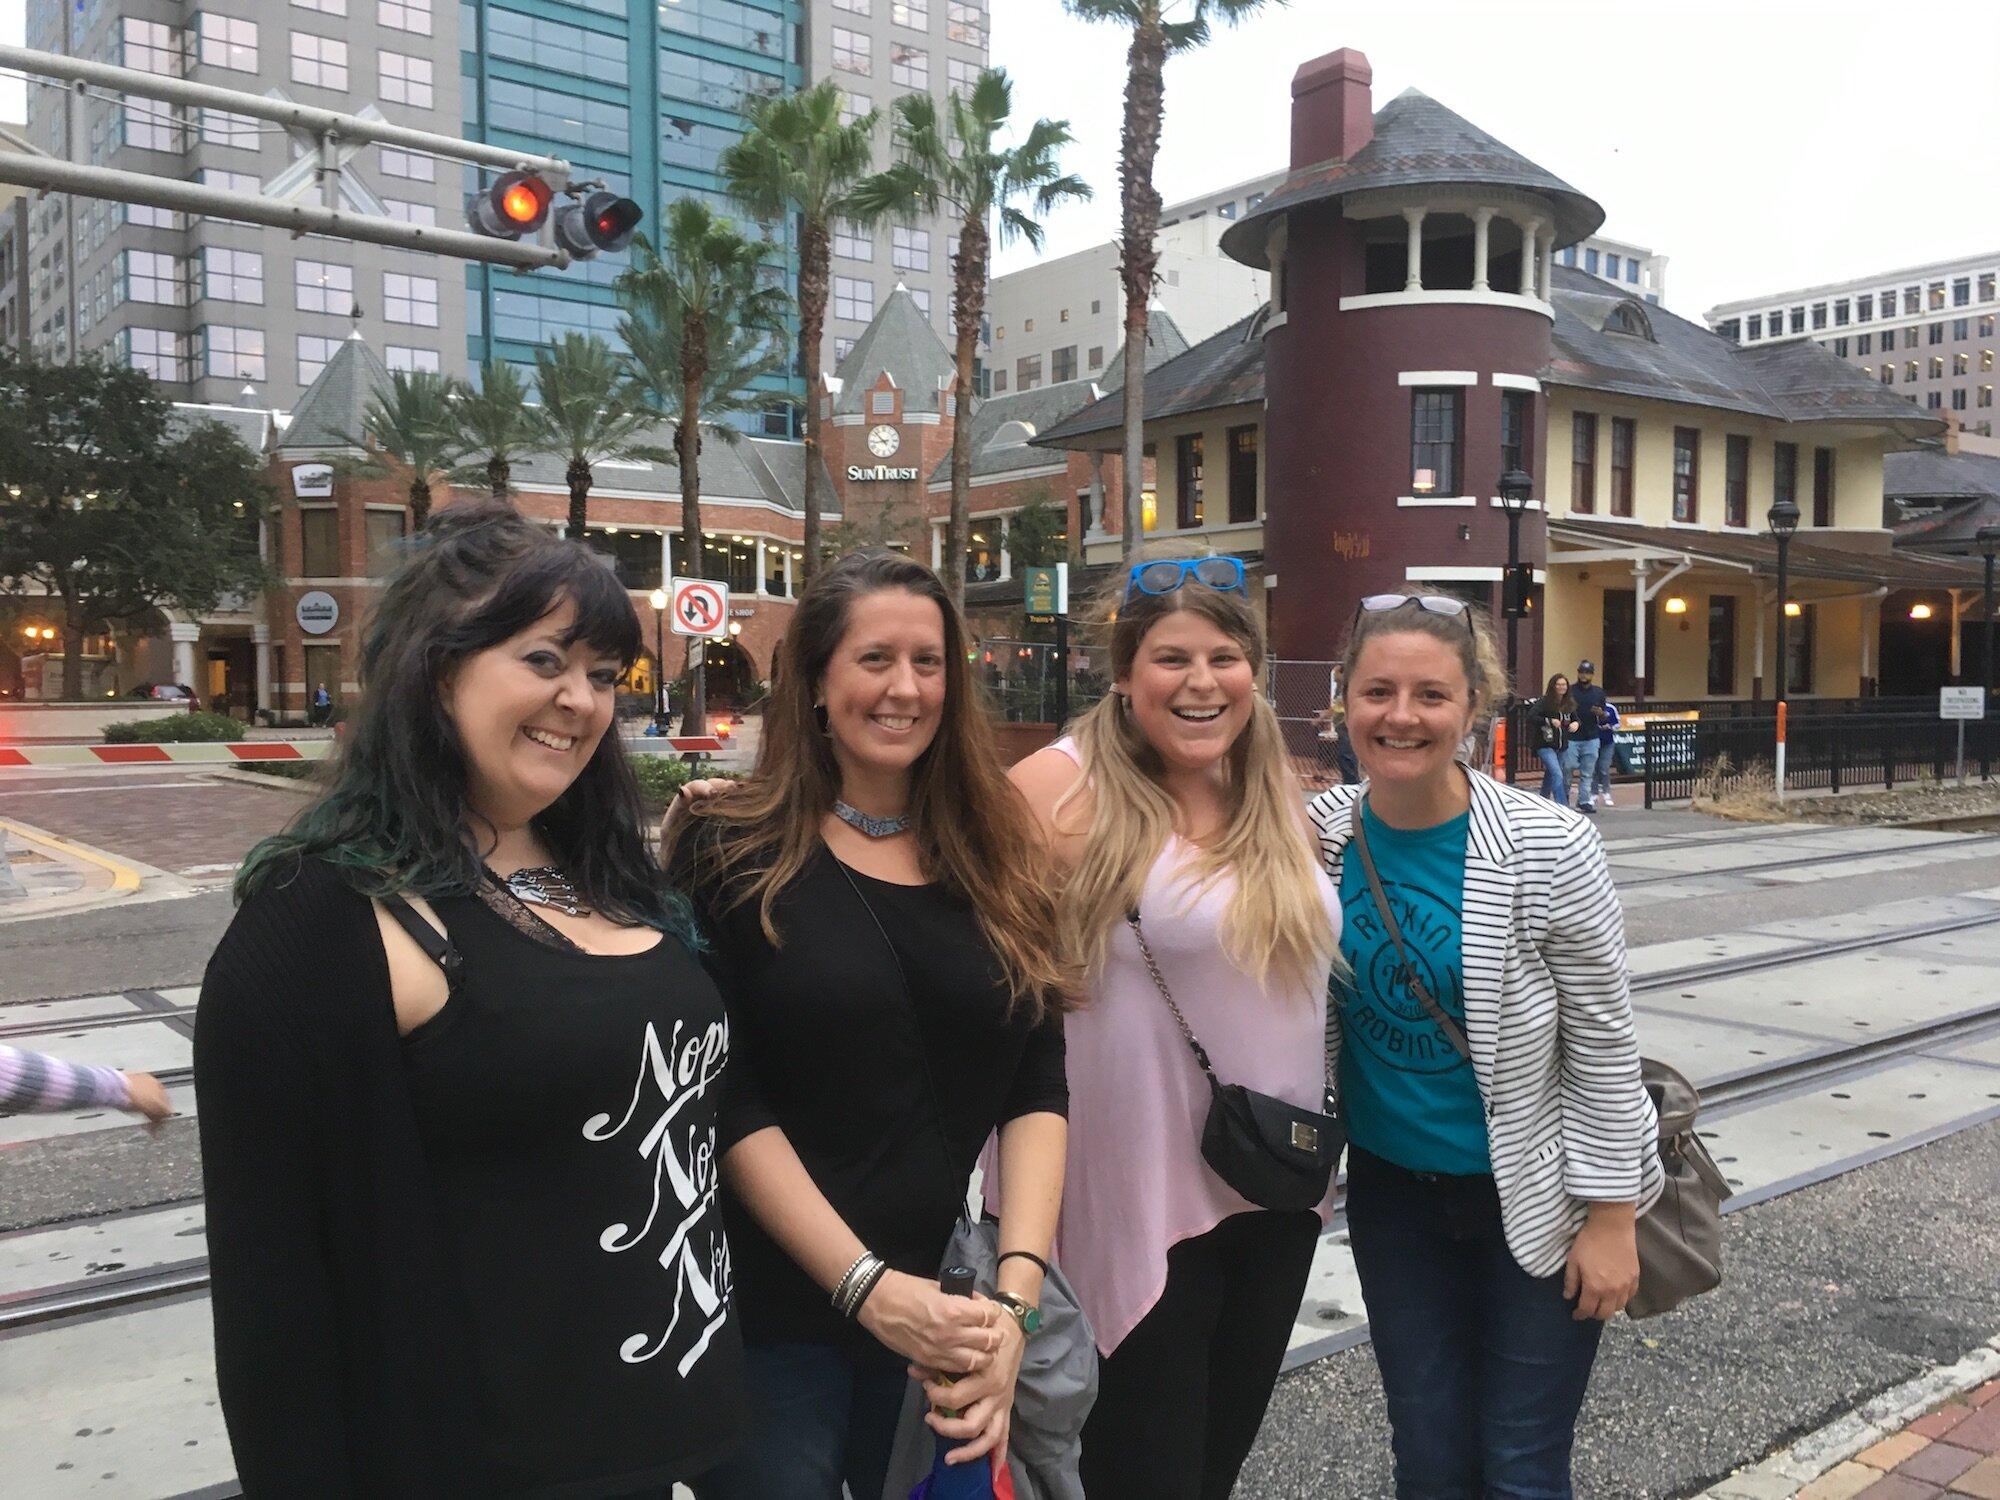 Historic Downtown Walking Tour: $35